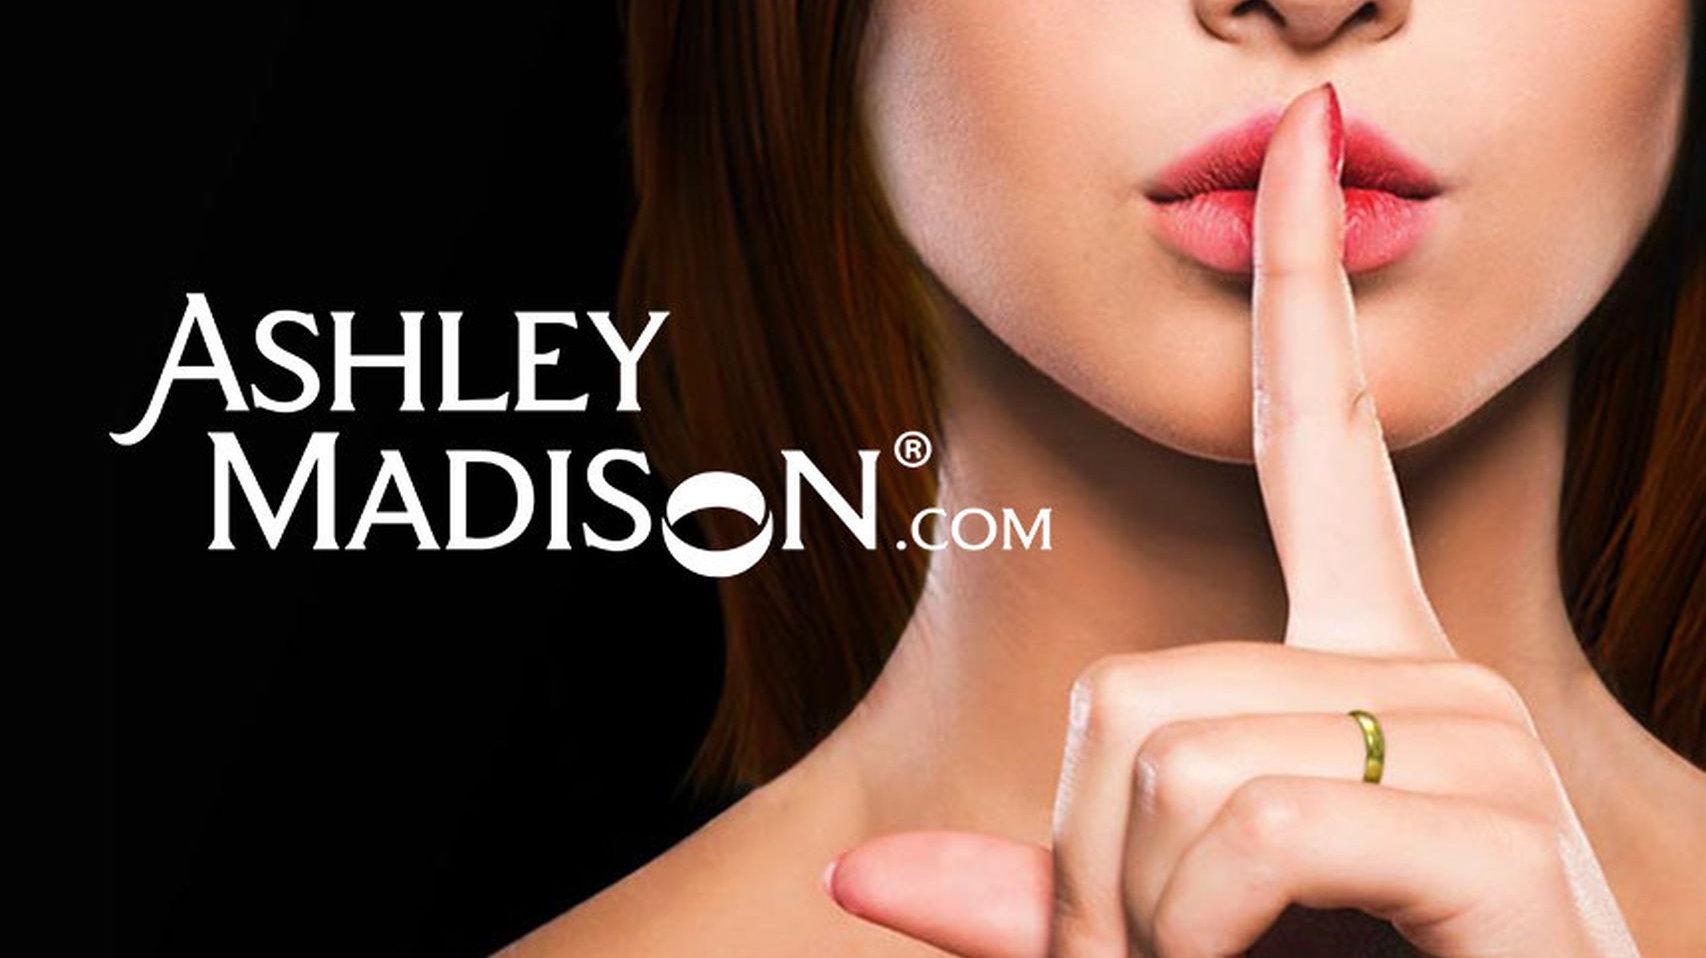 ashley_madison_review_11